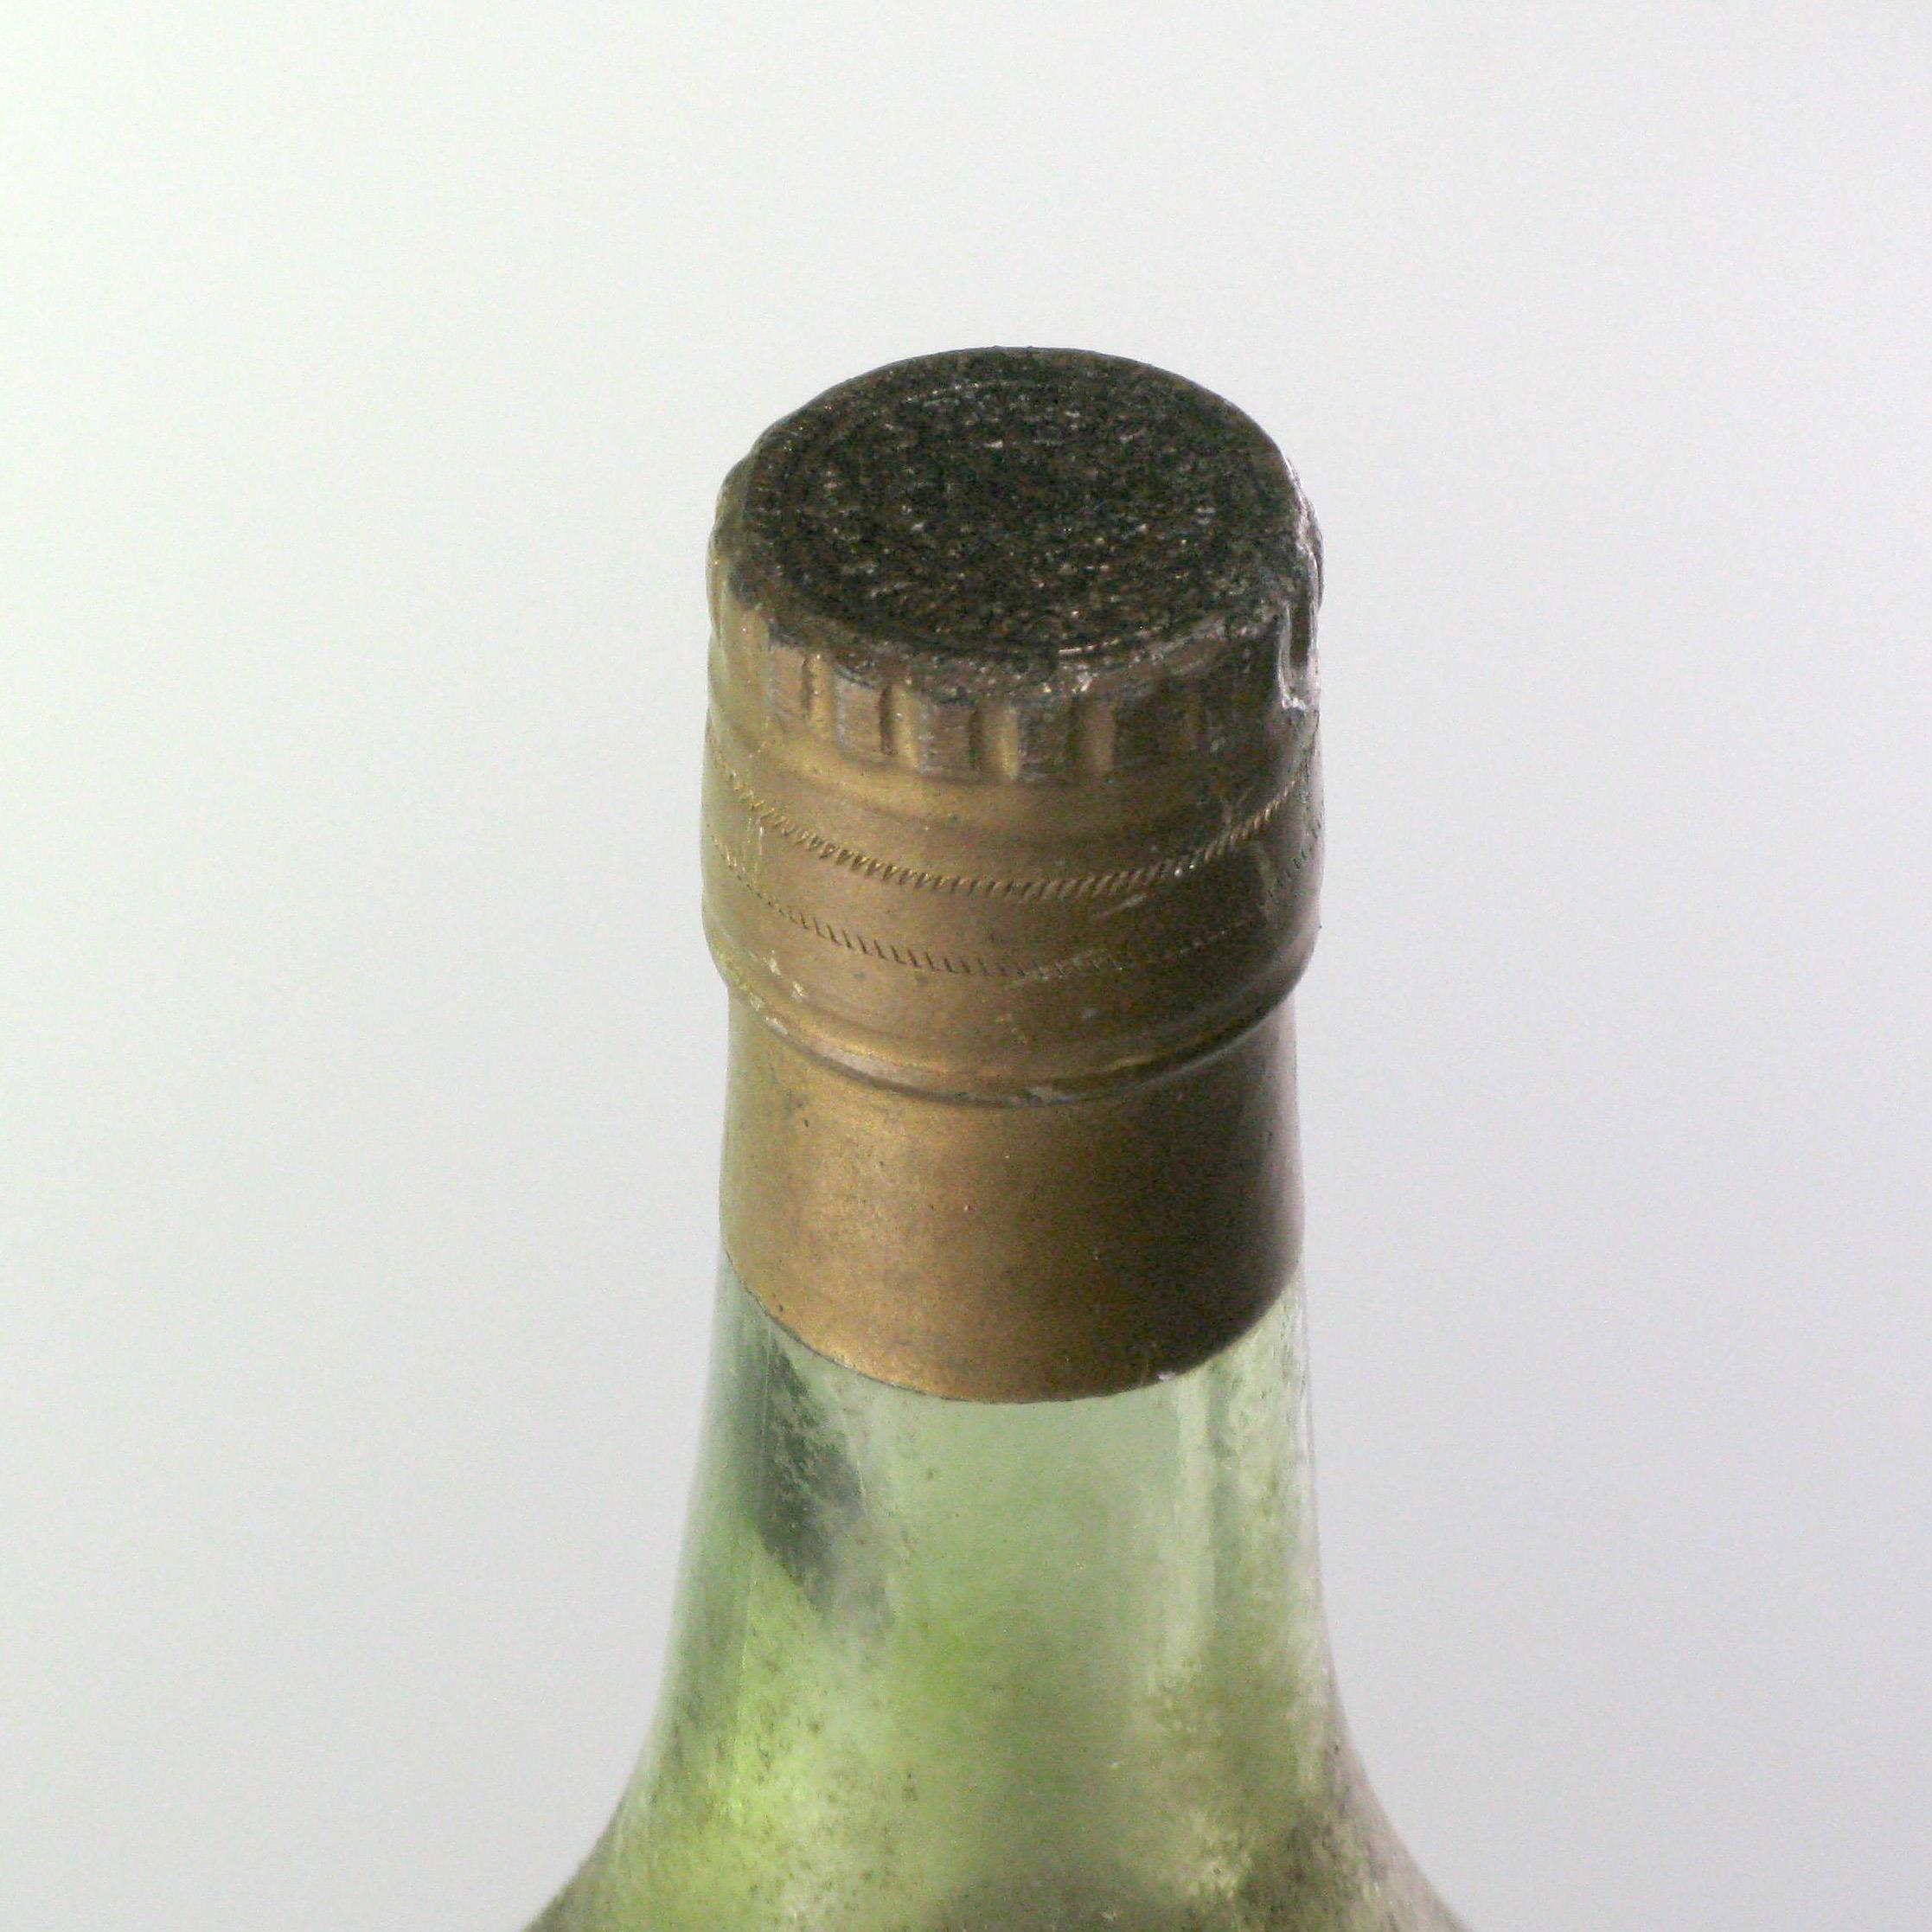 Cognac 1878 Salignac